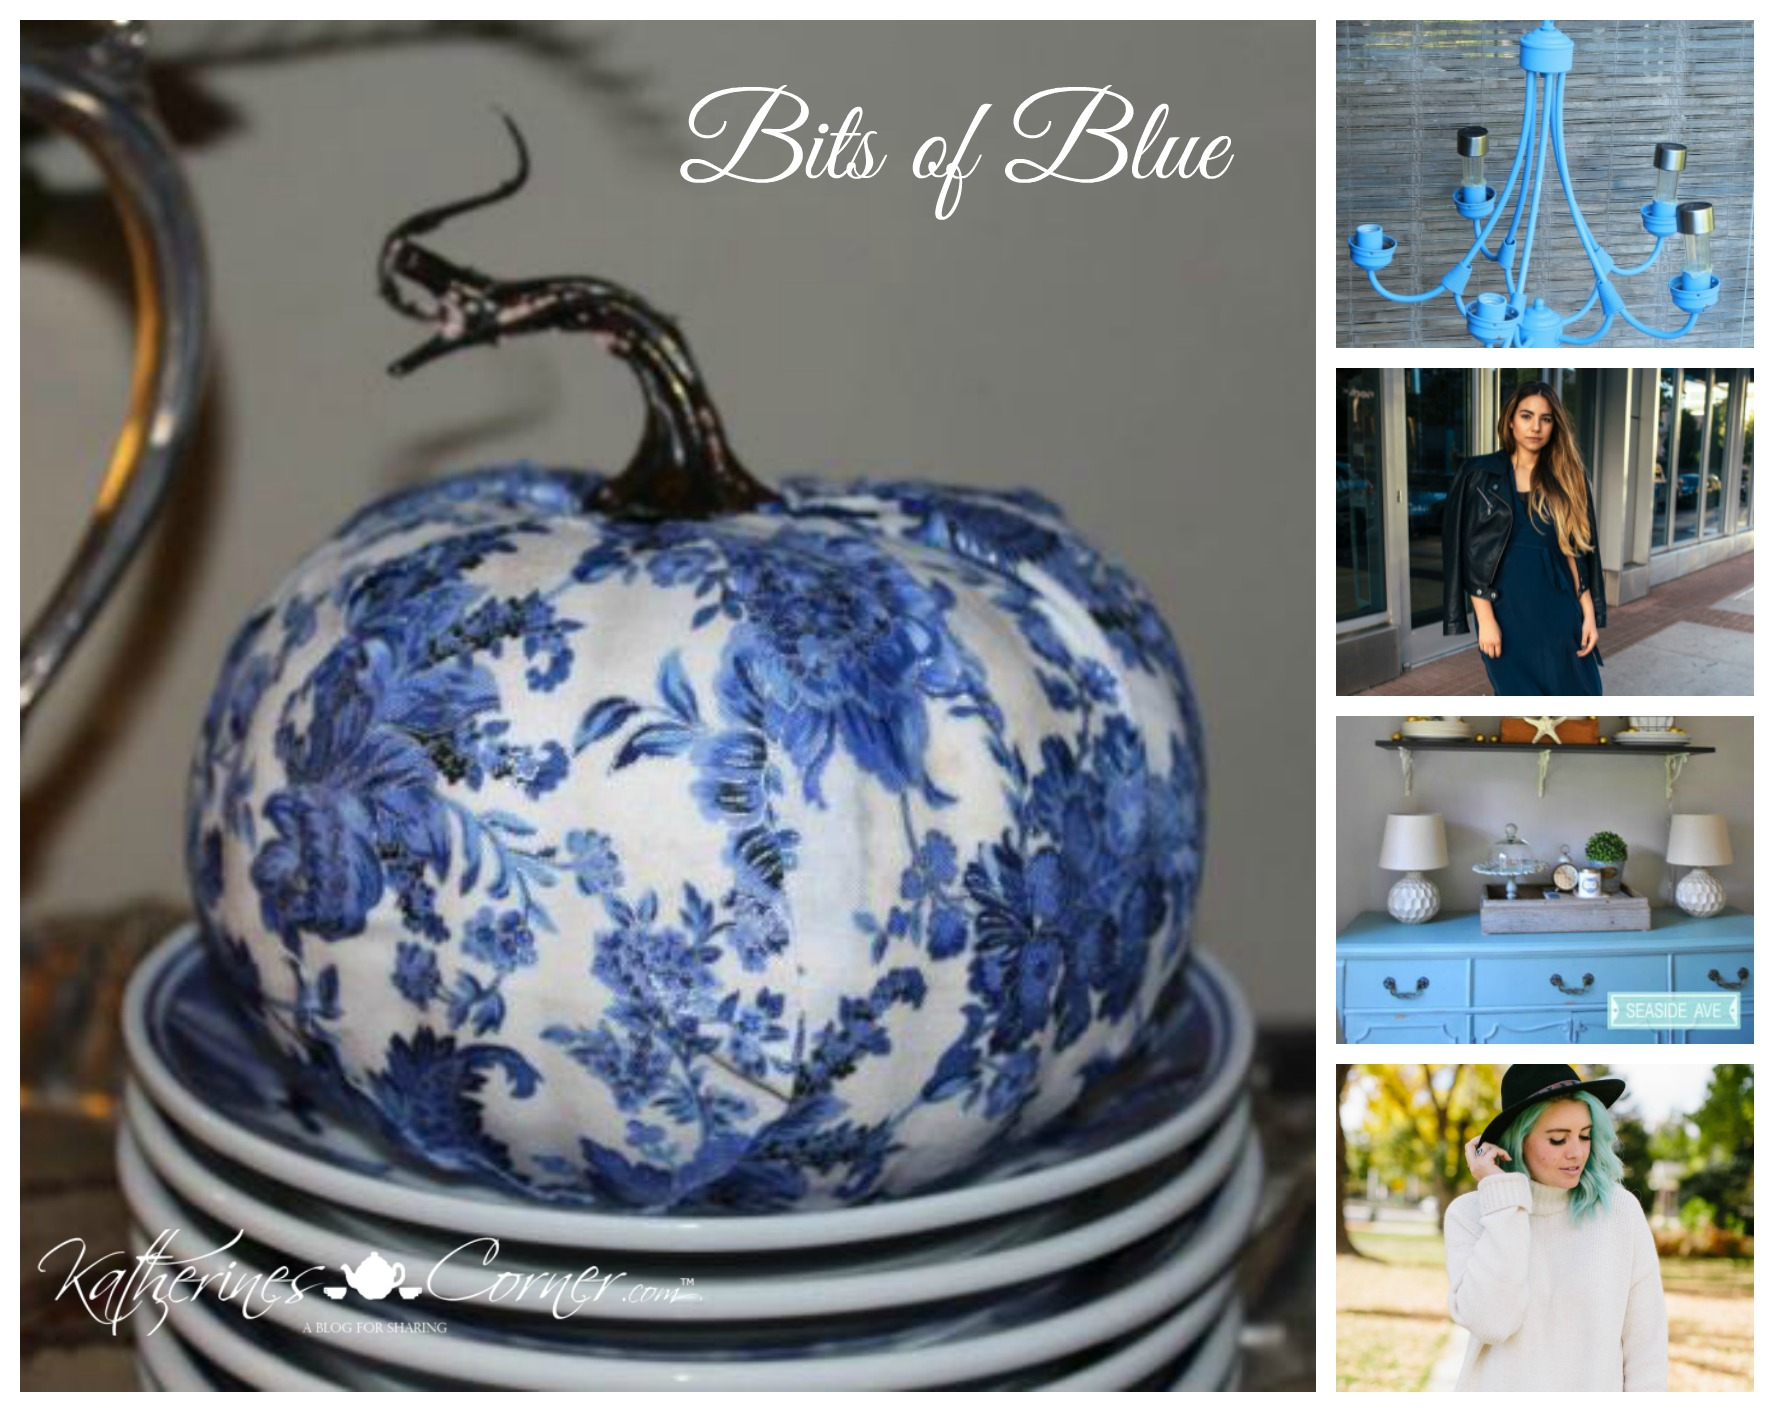 Bits of Blue Monday Inspirations